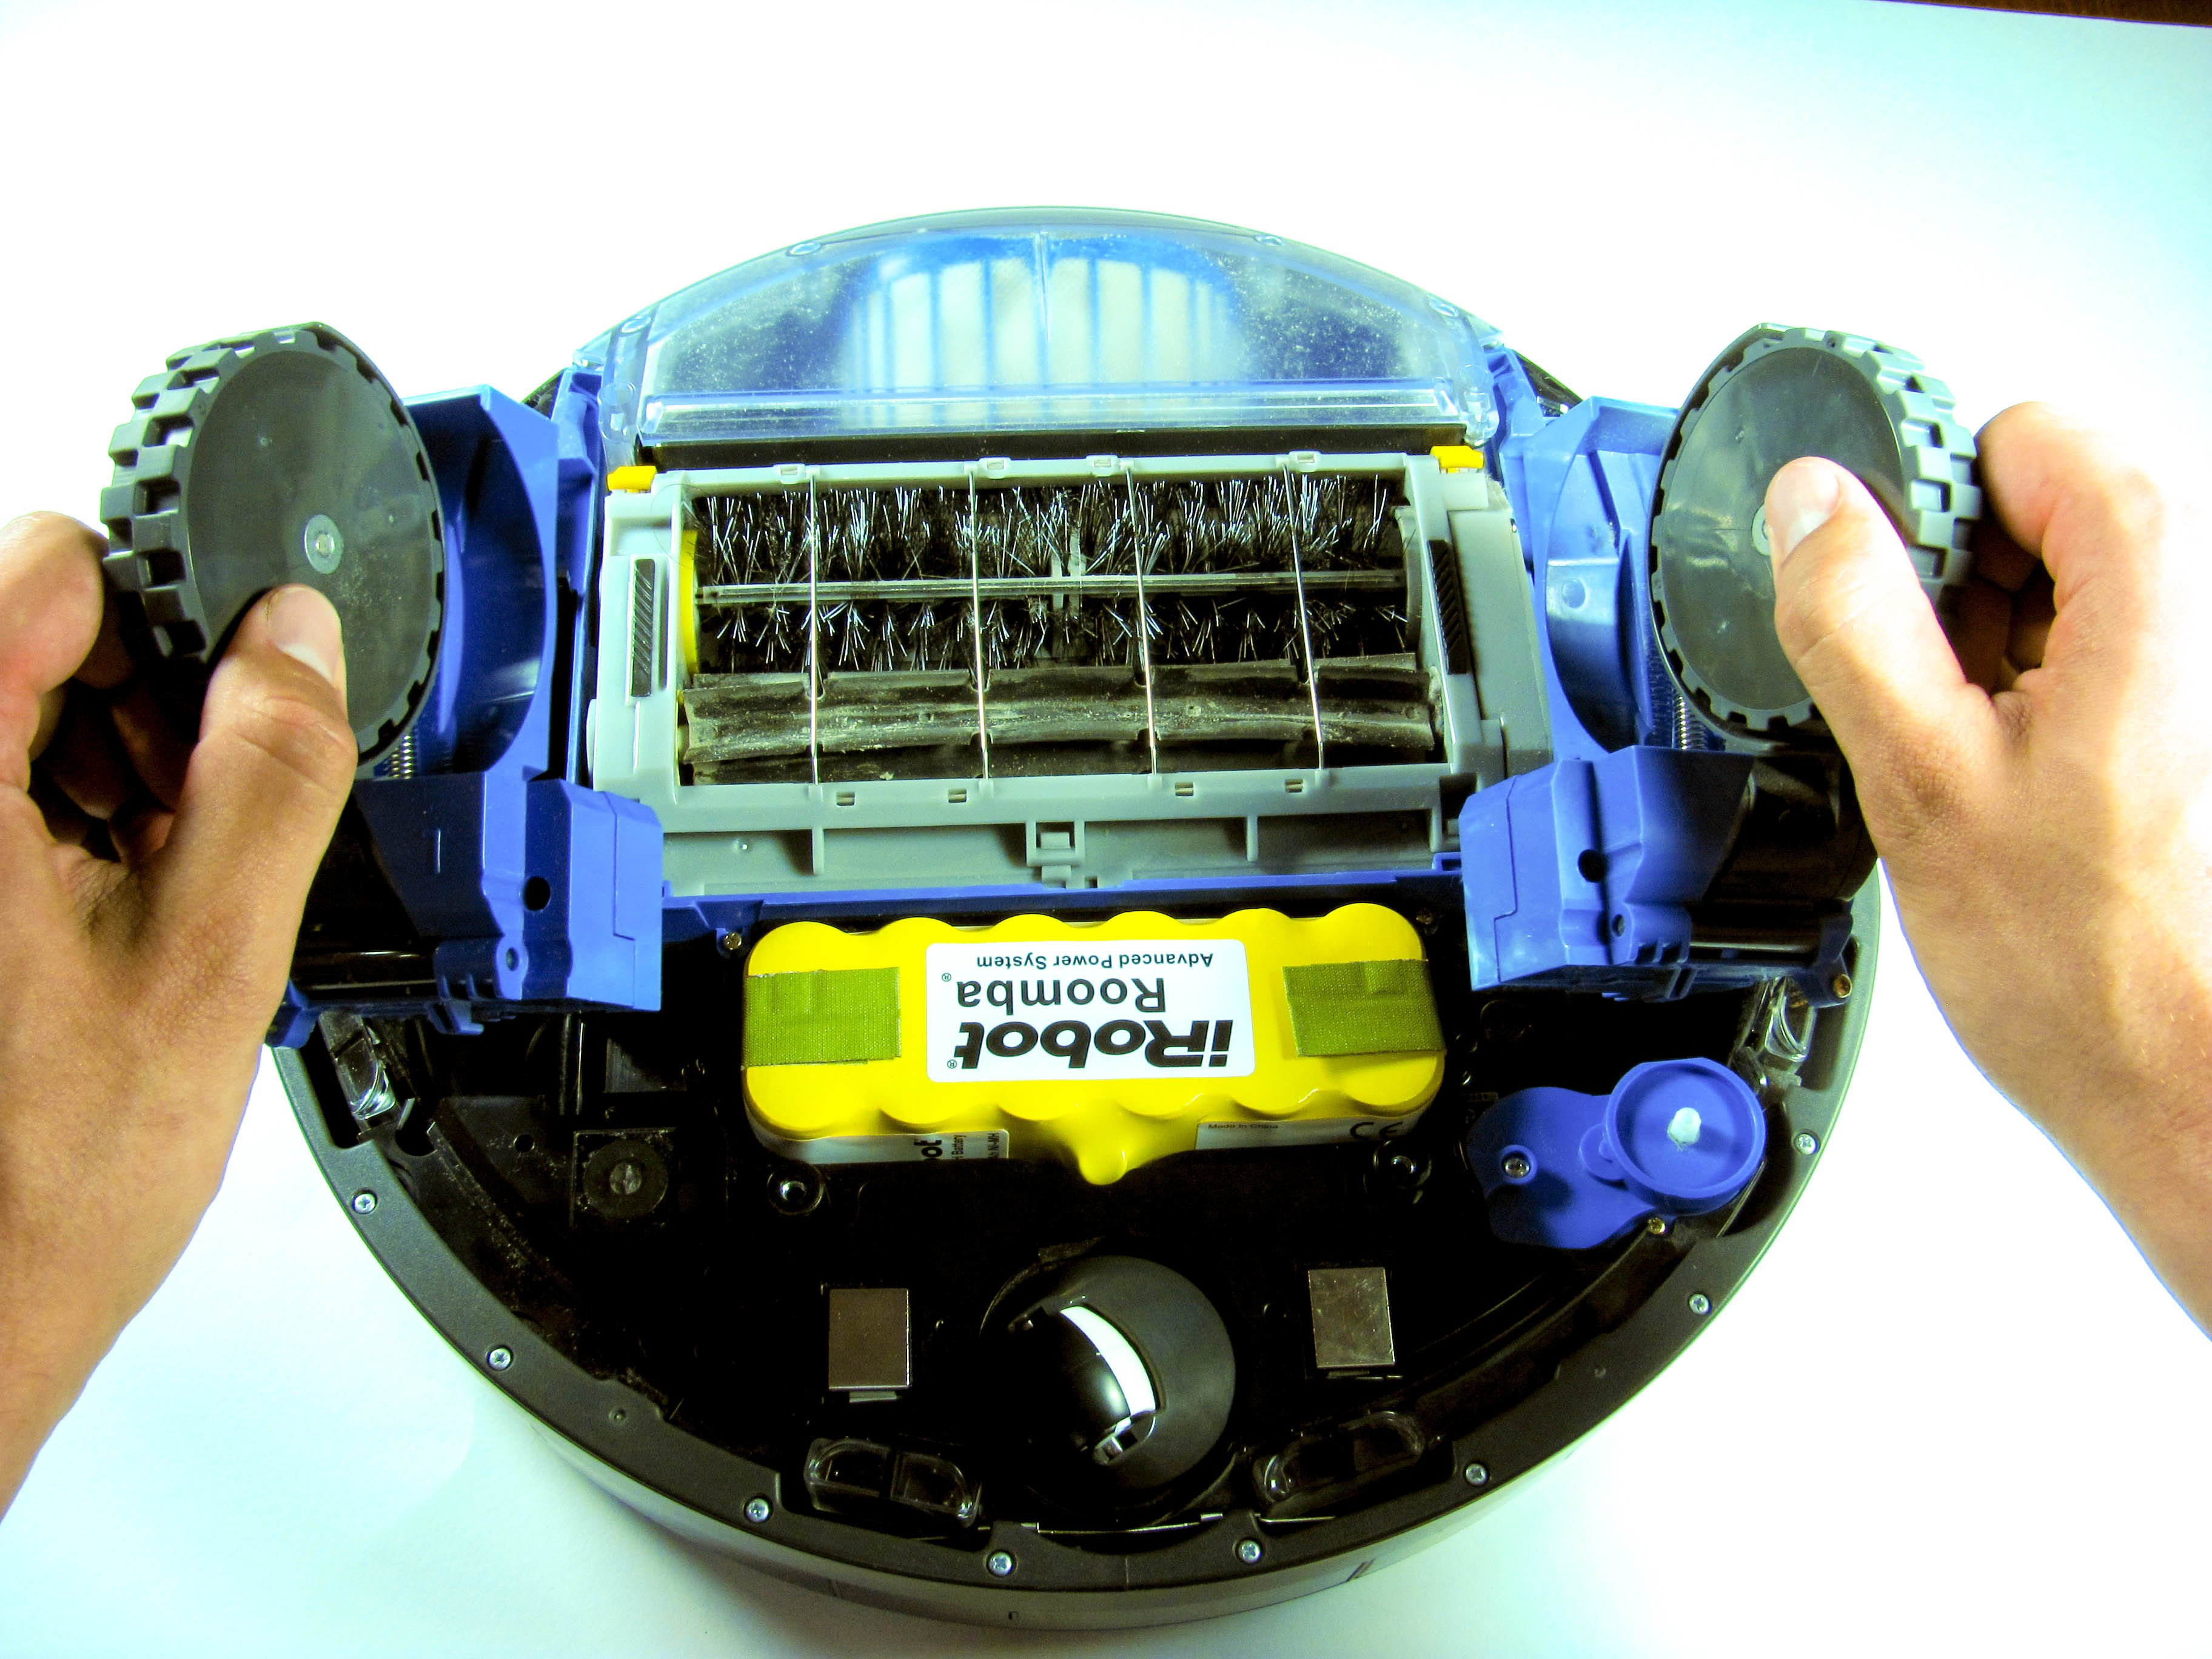 iRobot Roomba 650 Main Wheel Replacement - iFixit Repair Guide